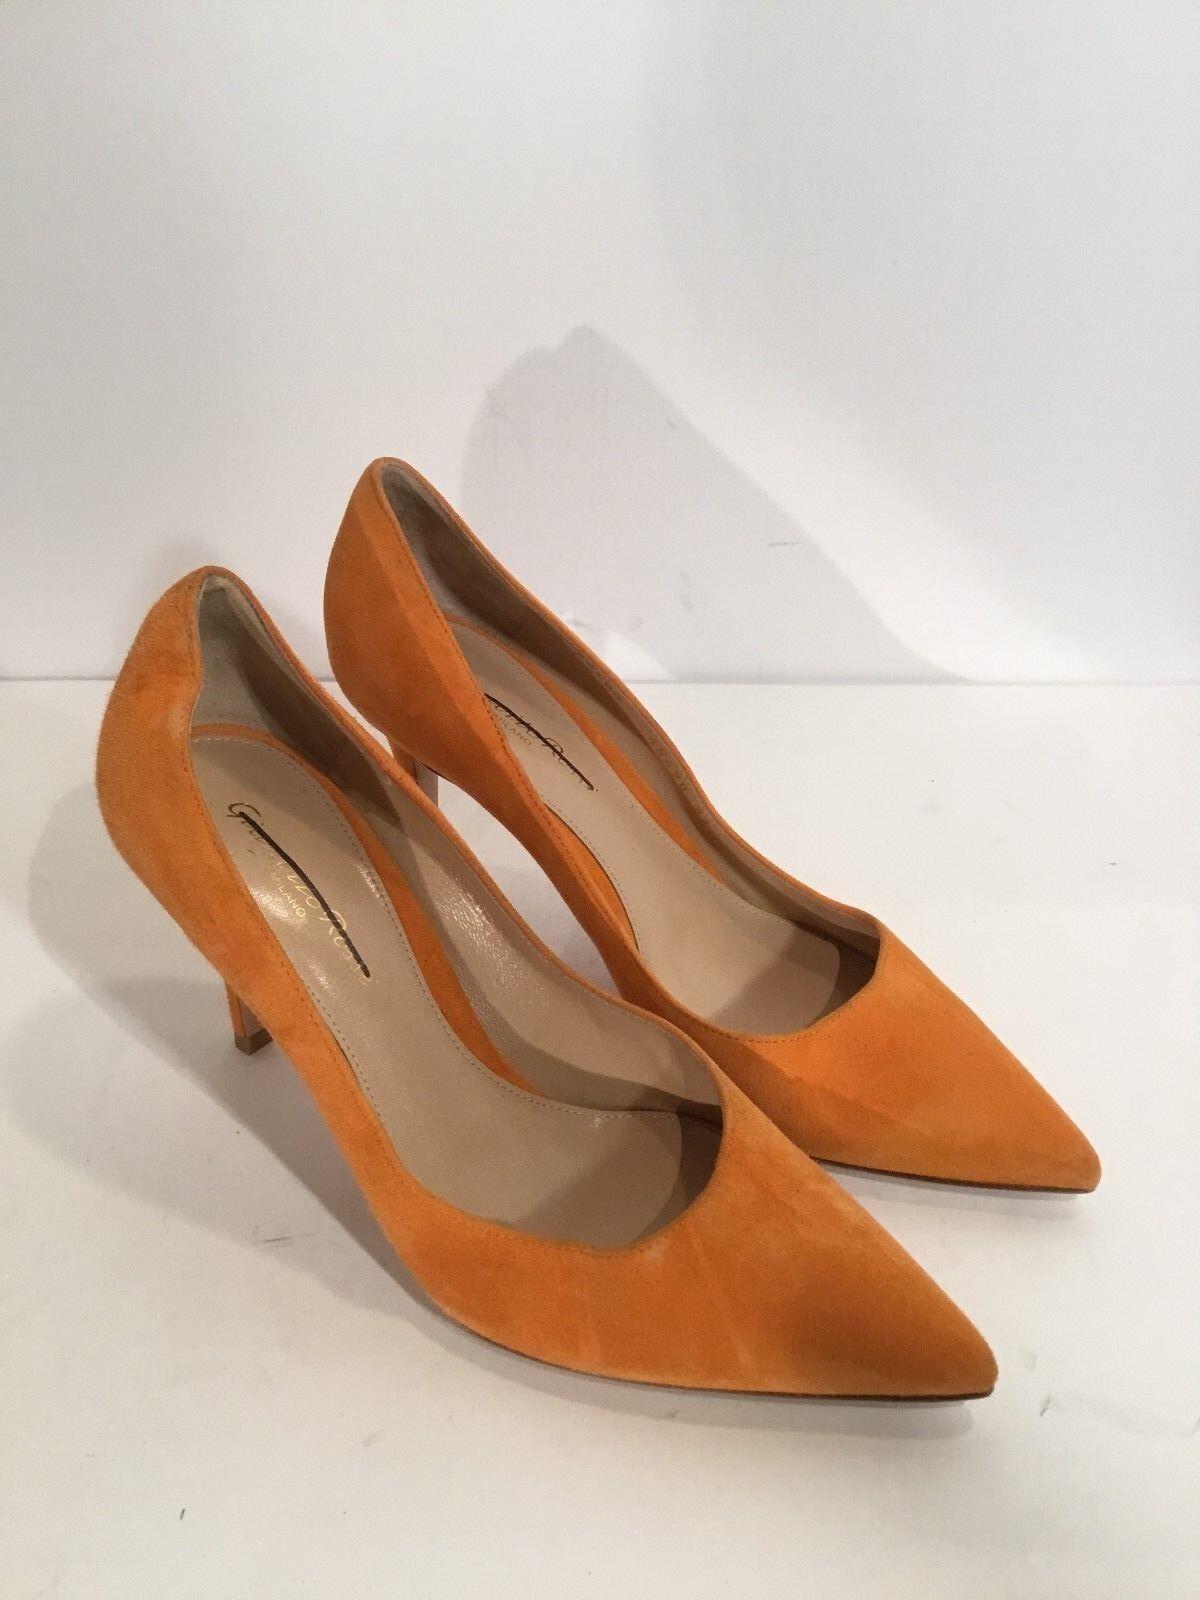 Sergio Rossi  Orange Suede Pointed Toe Pumps Heels Godiva Sz 40 $630